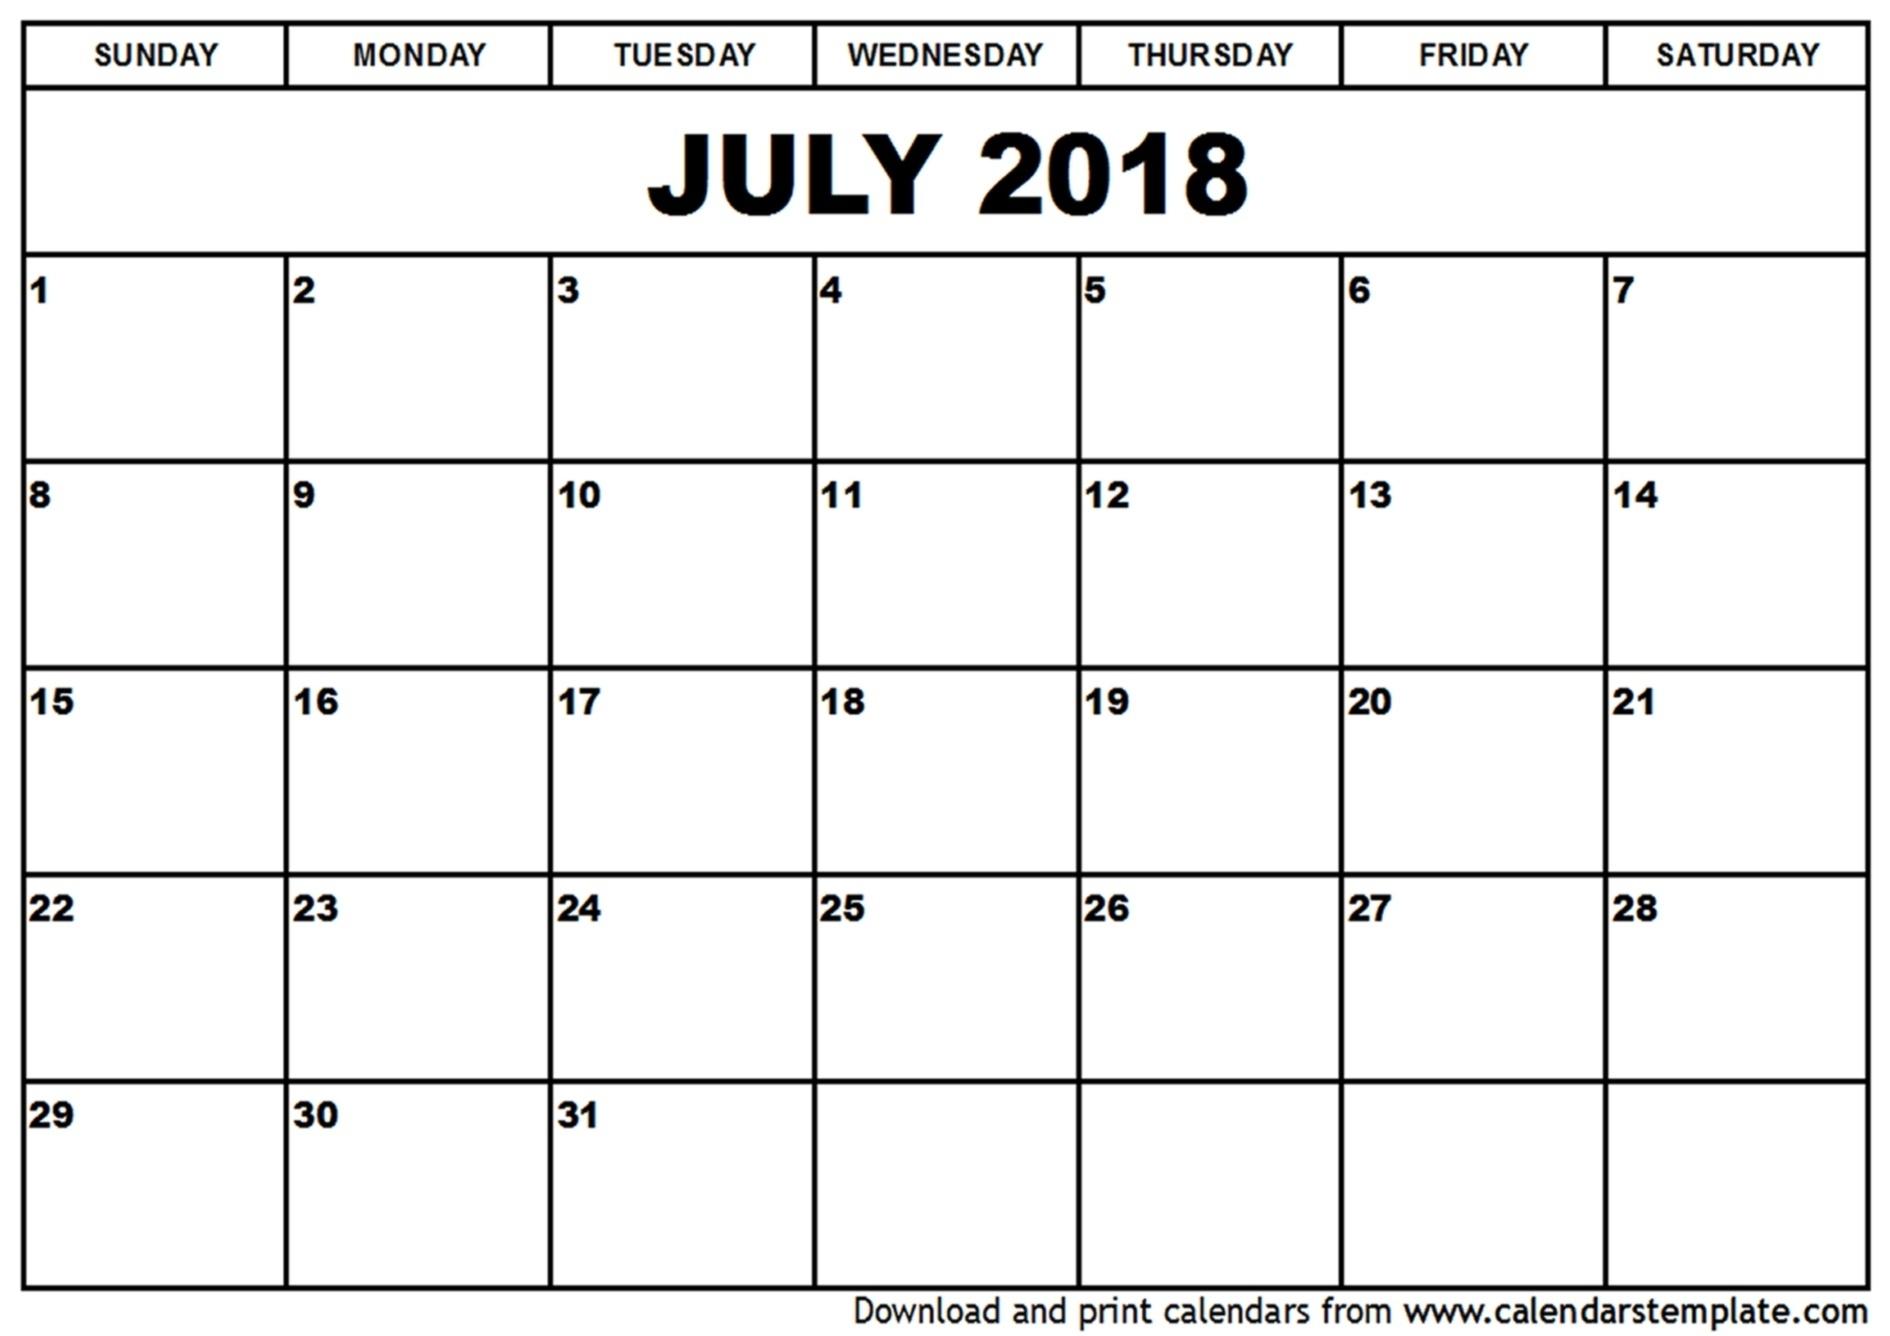 Free Printable 4X6 Monthly Calendar • Printable Blank